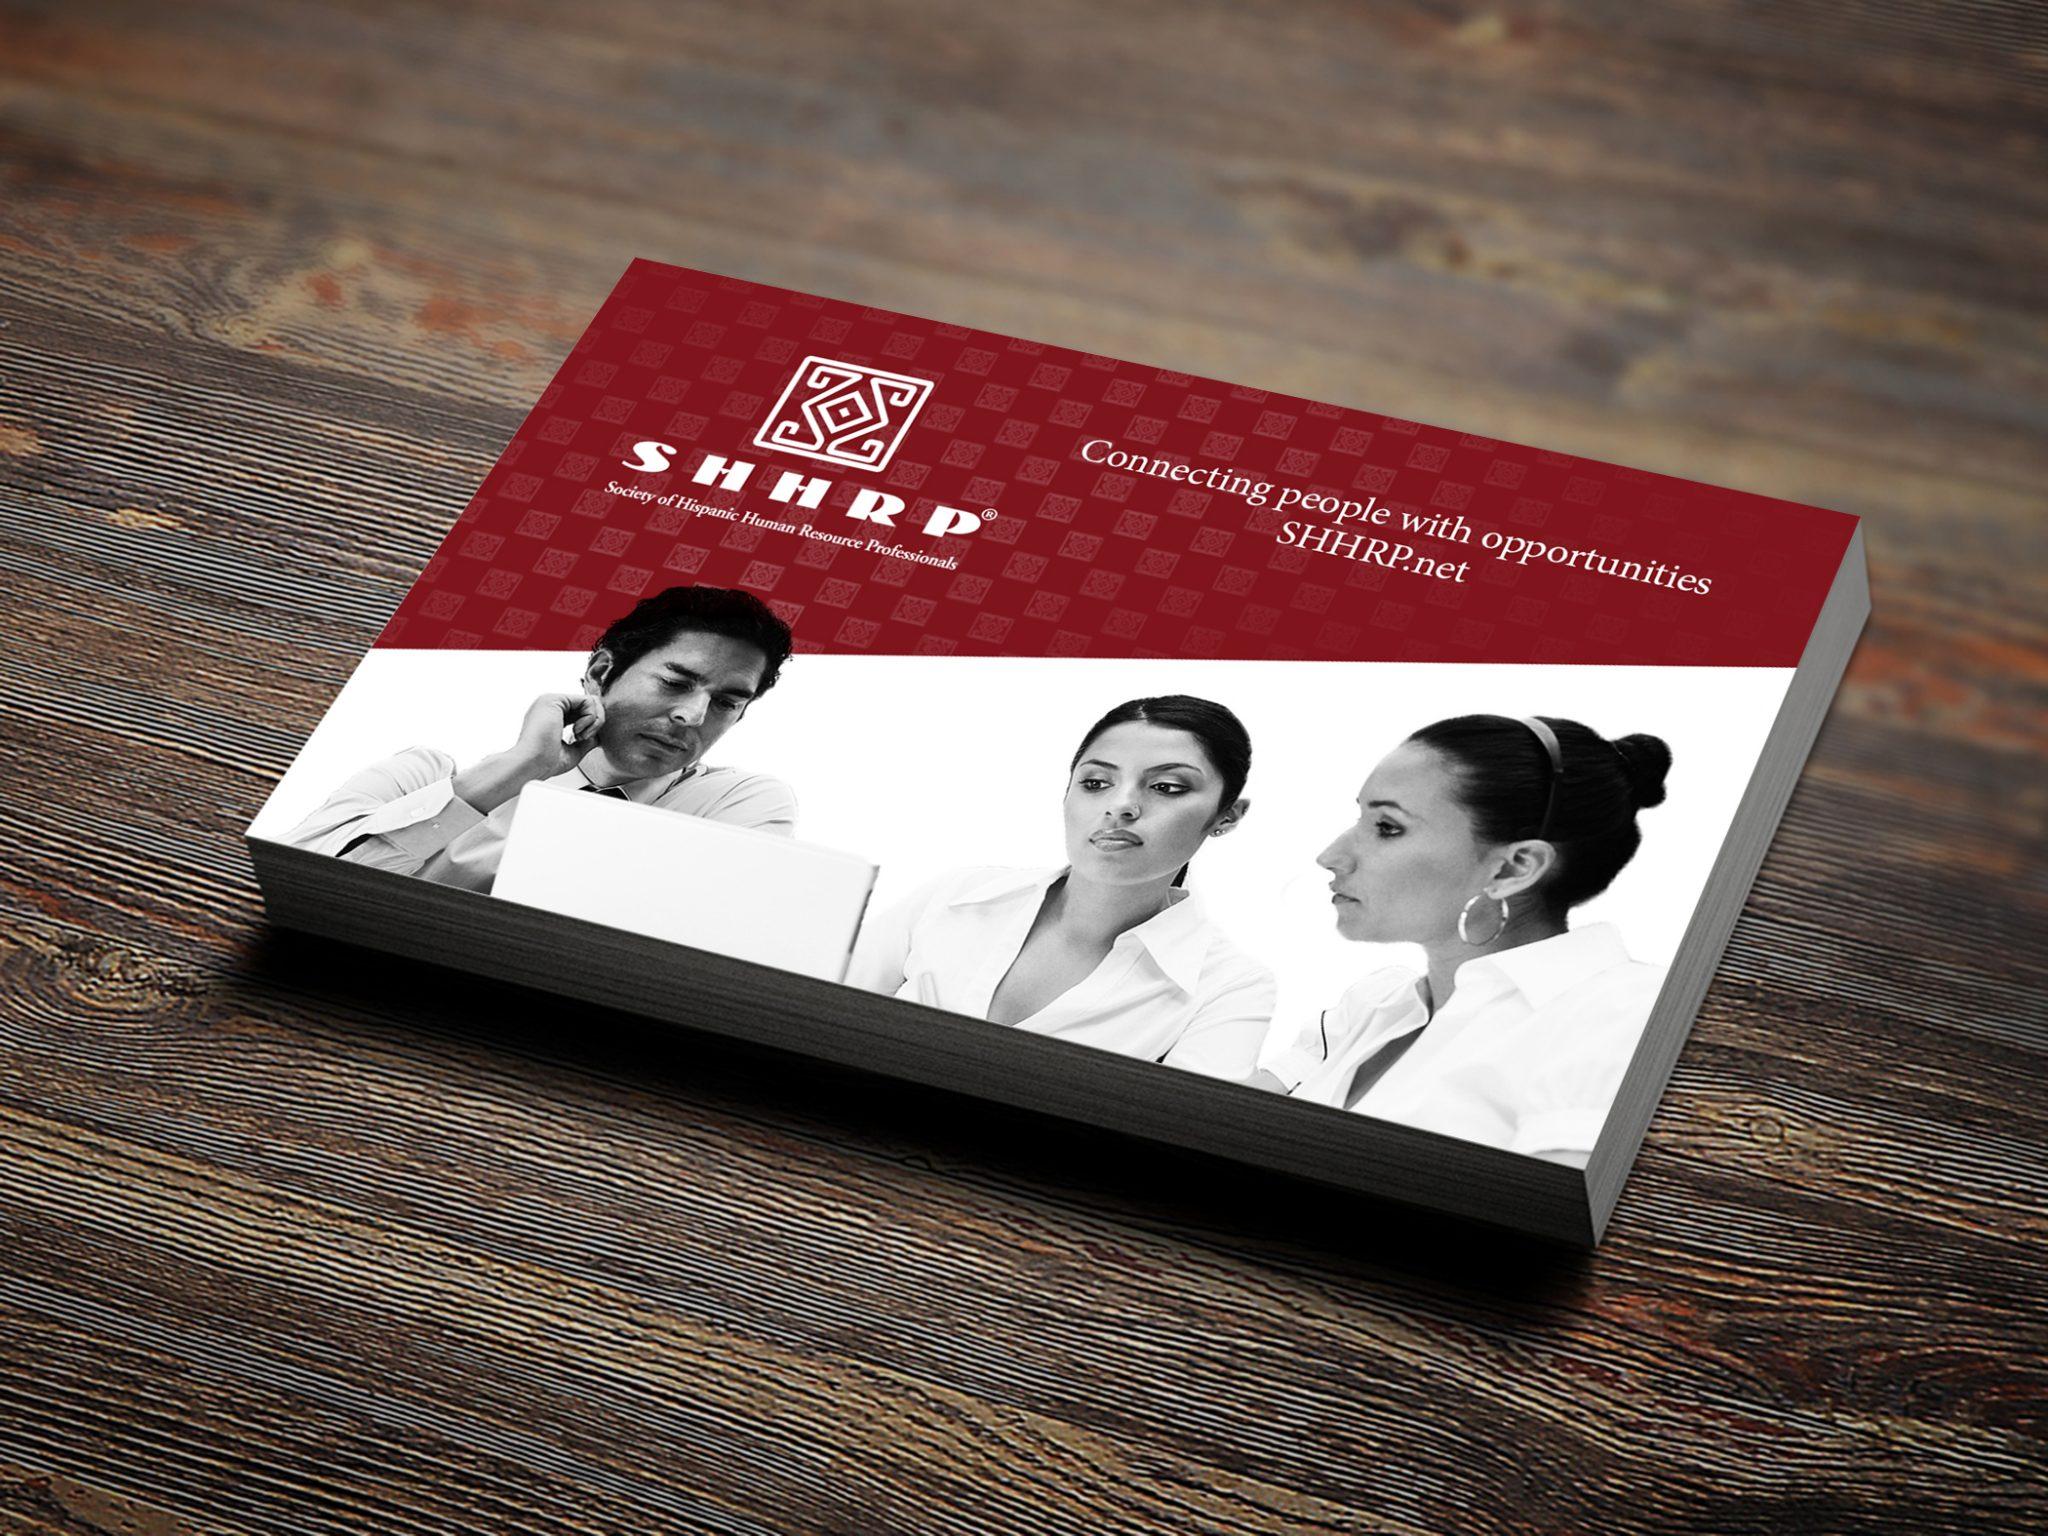 Society of Hispanic Human Resource Professionals Business Card